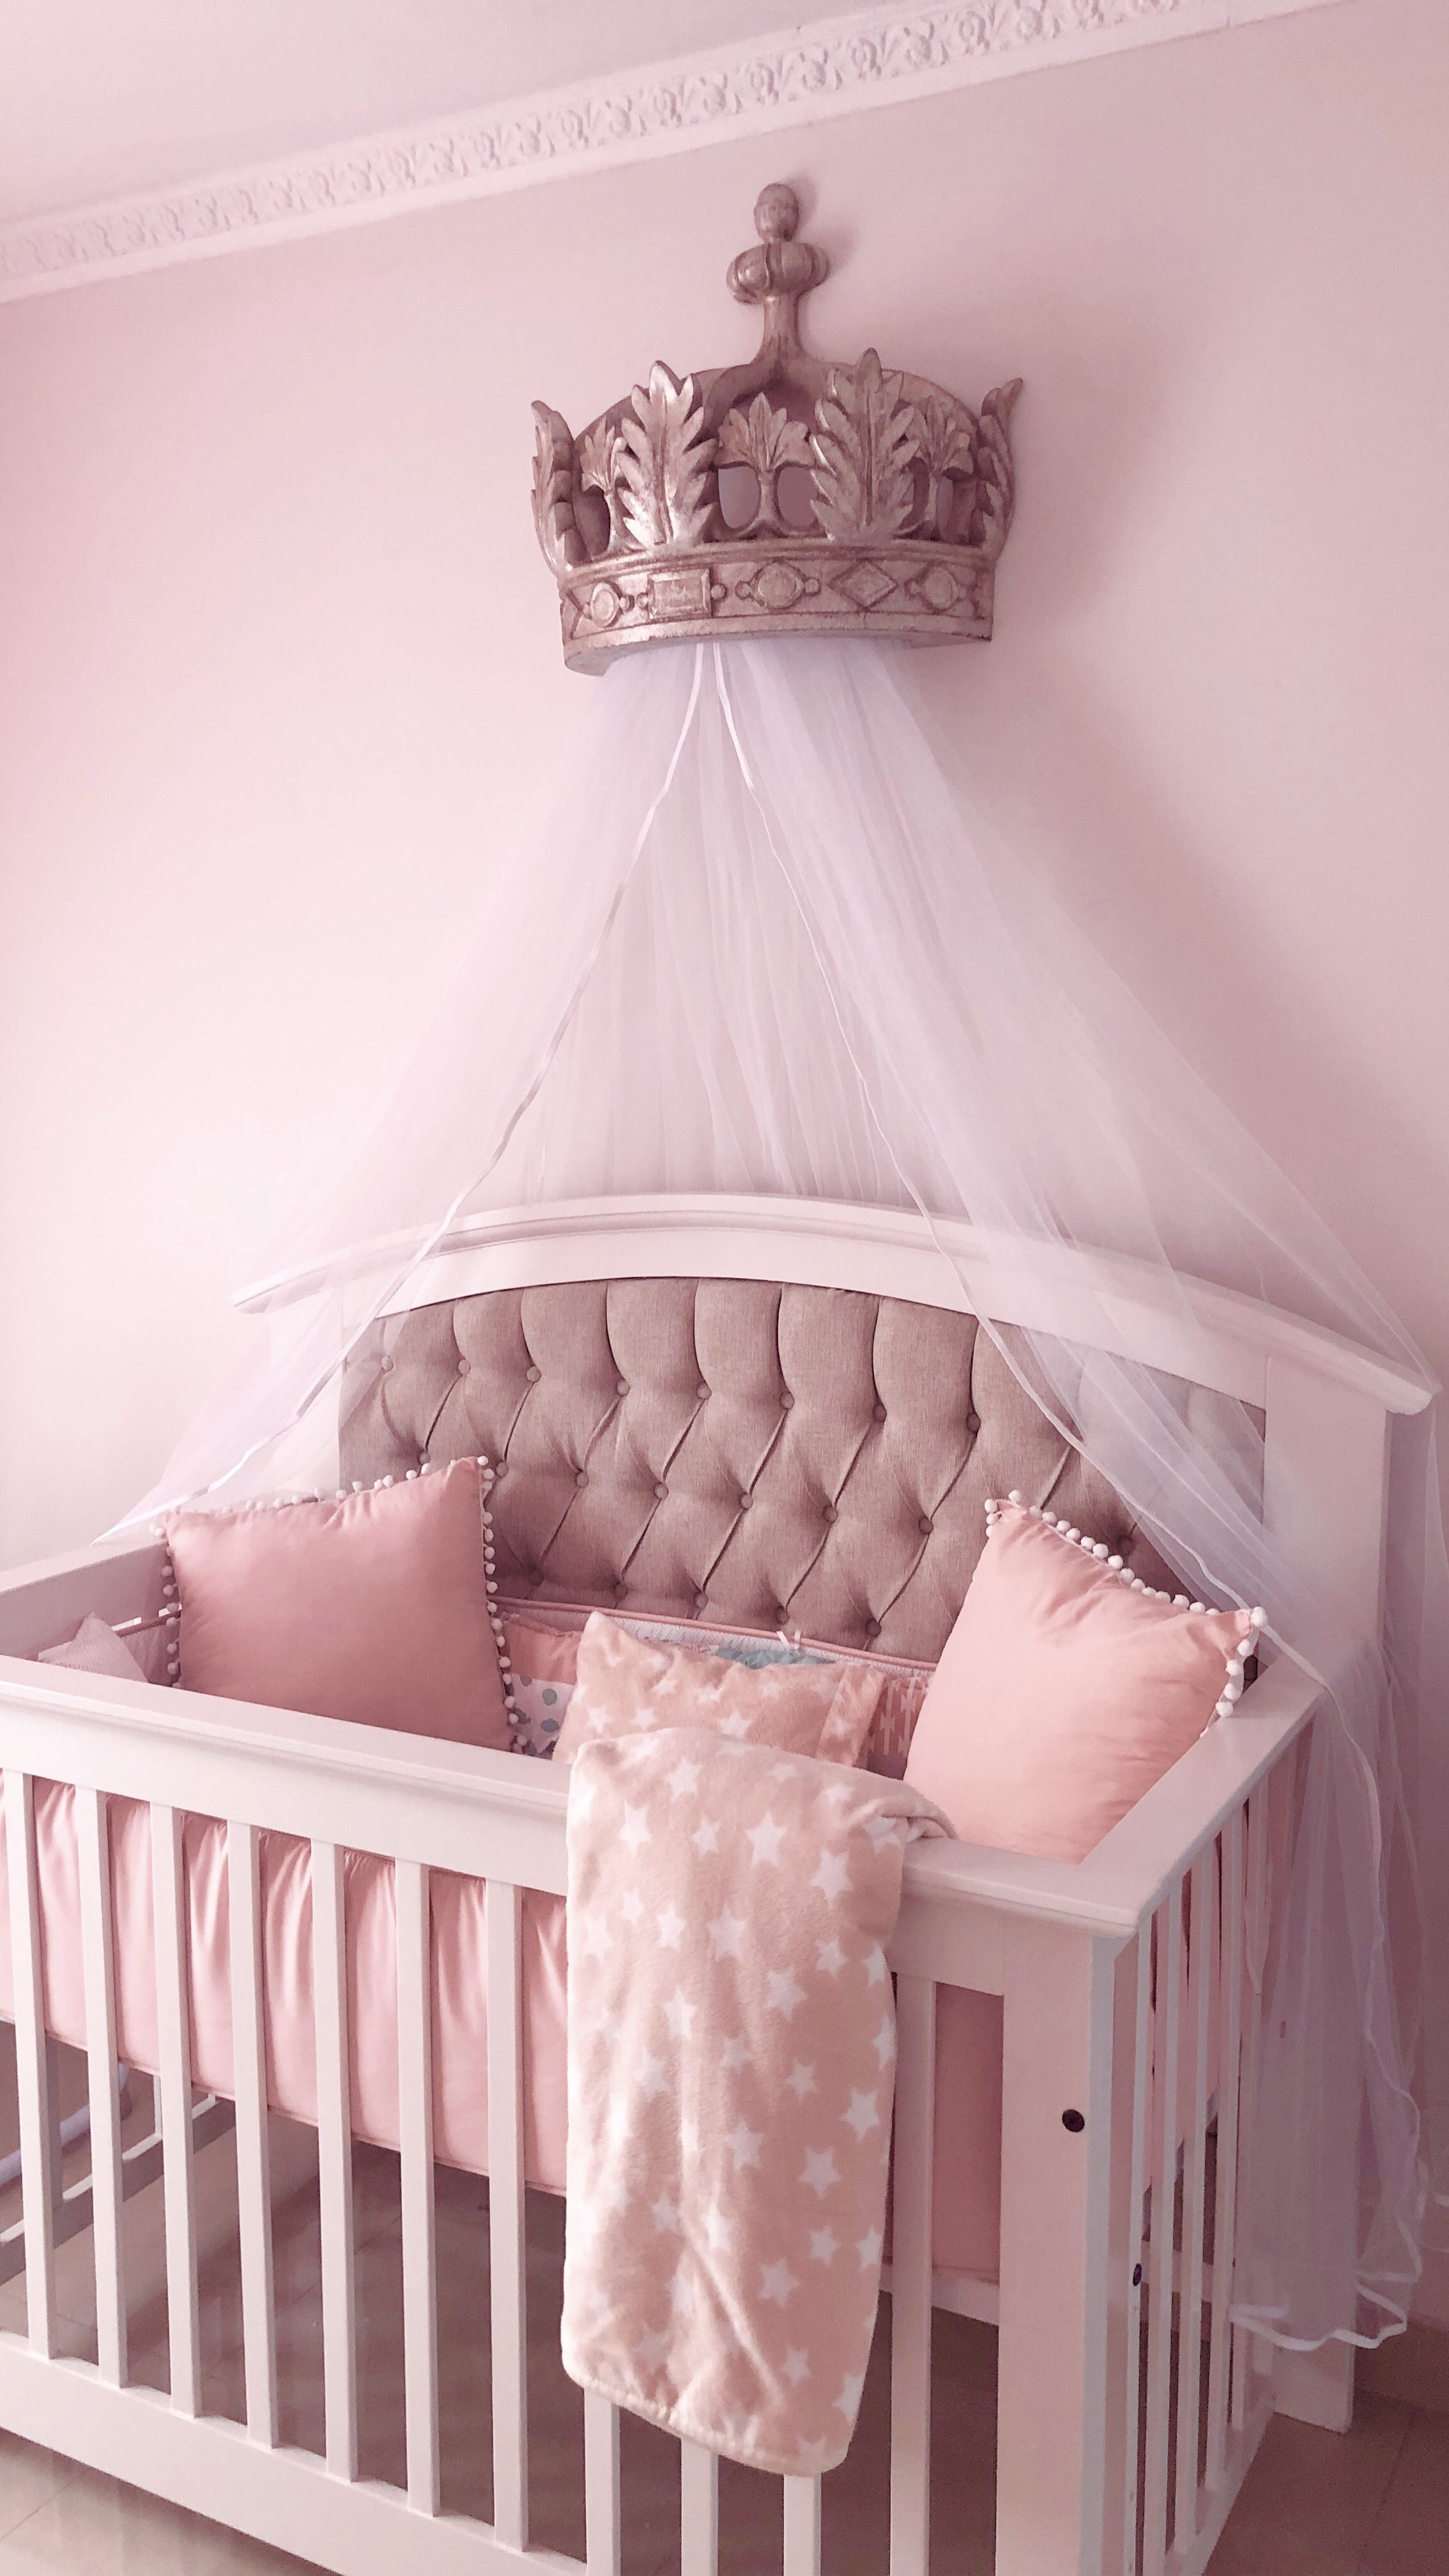 Princess nursery, crown canopy Baby girl room, Nursery